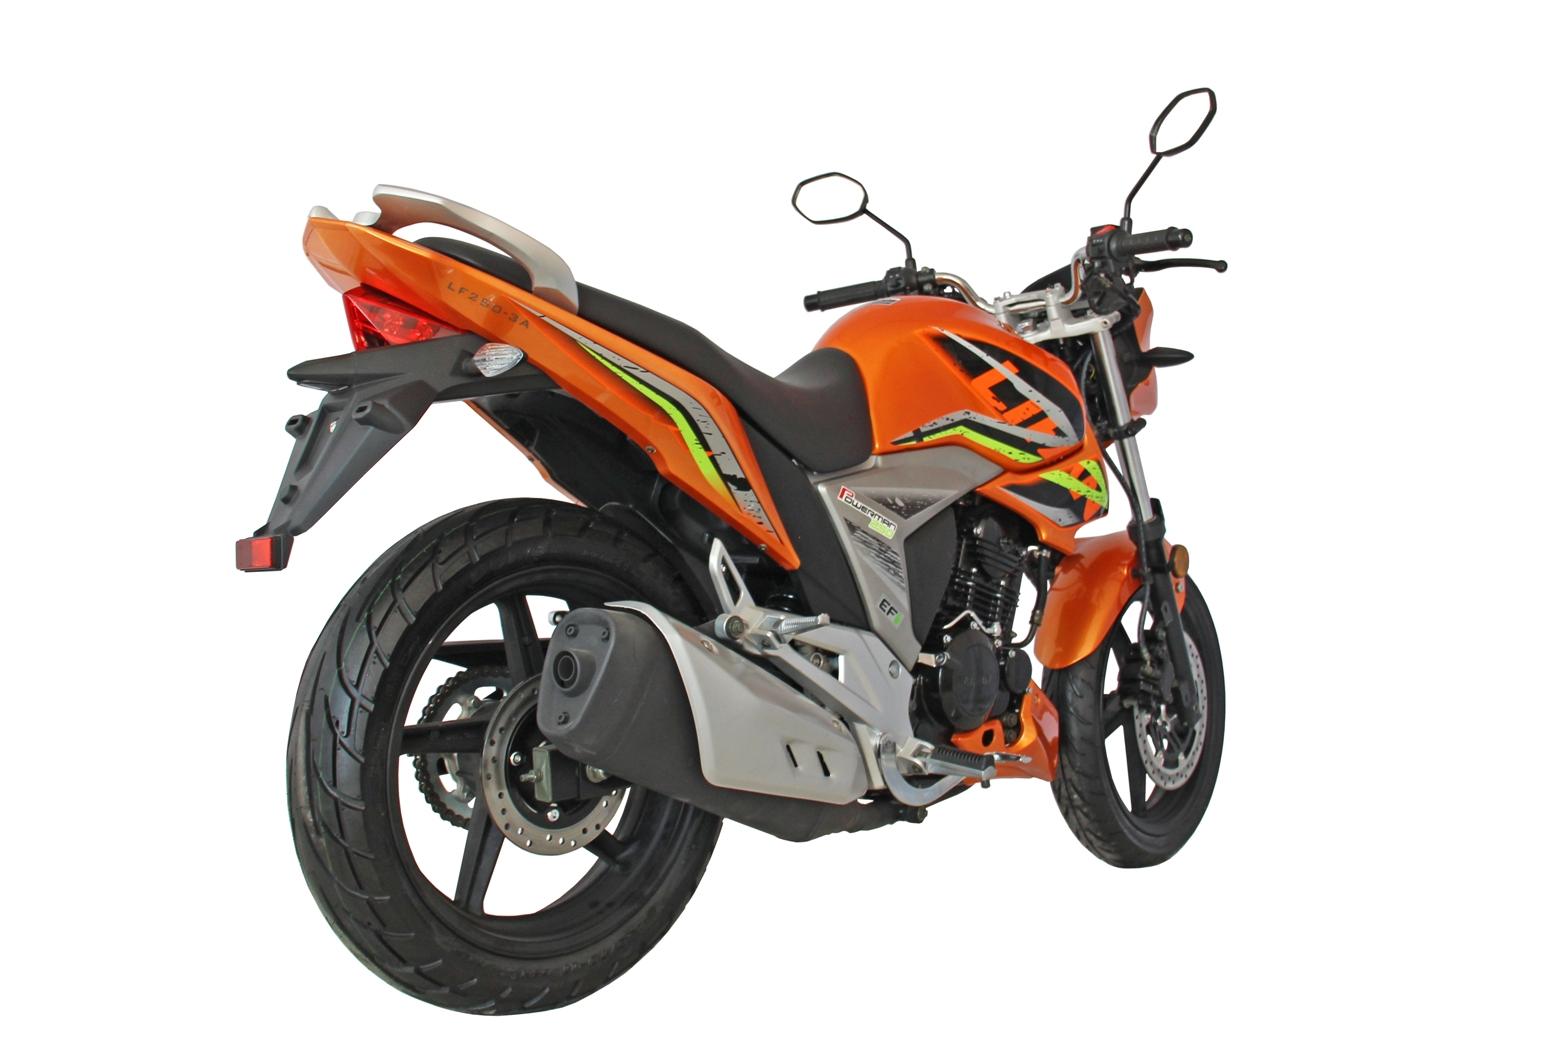 МОТОЦИКЛ LIFAN LF250-3A Orange Pin ― Артмото - купить квадроцикл в украине и харькове, мотоцикл, снегоход, скутер, мопед, электромобиль